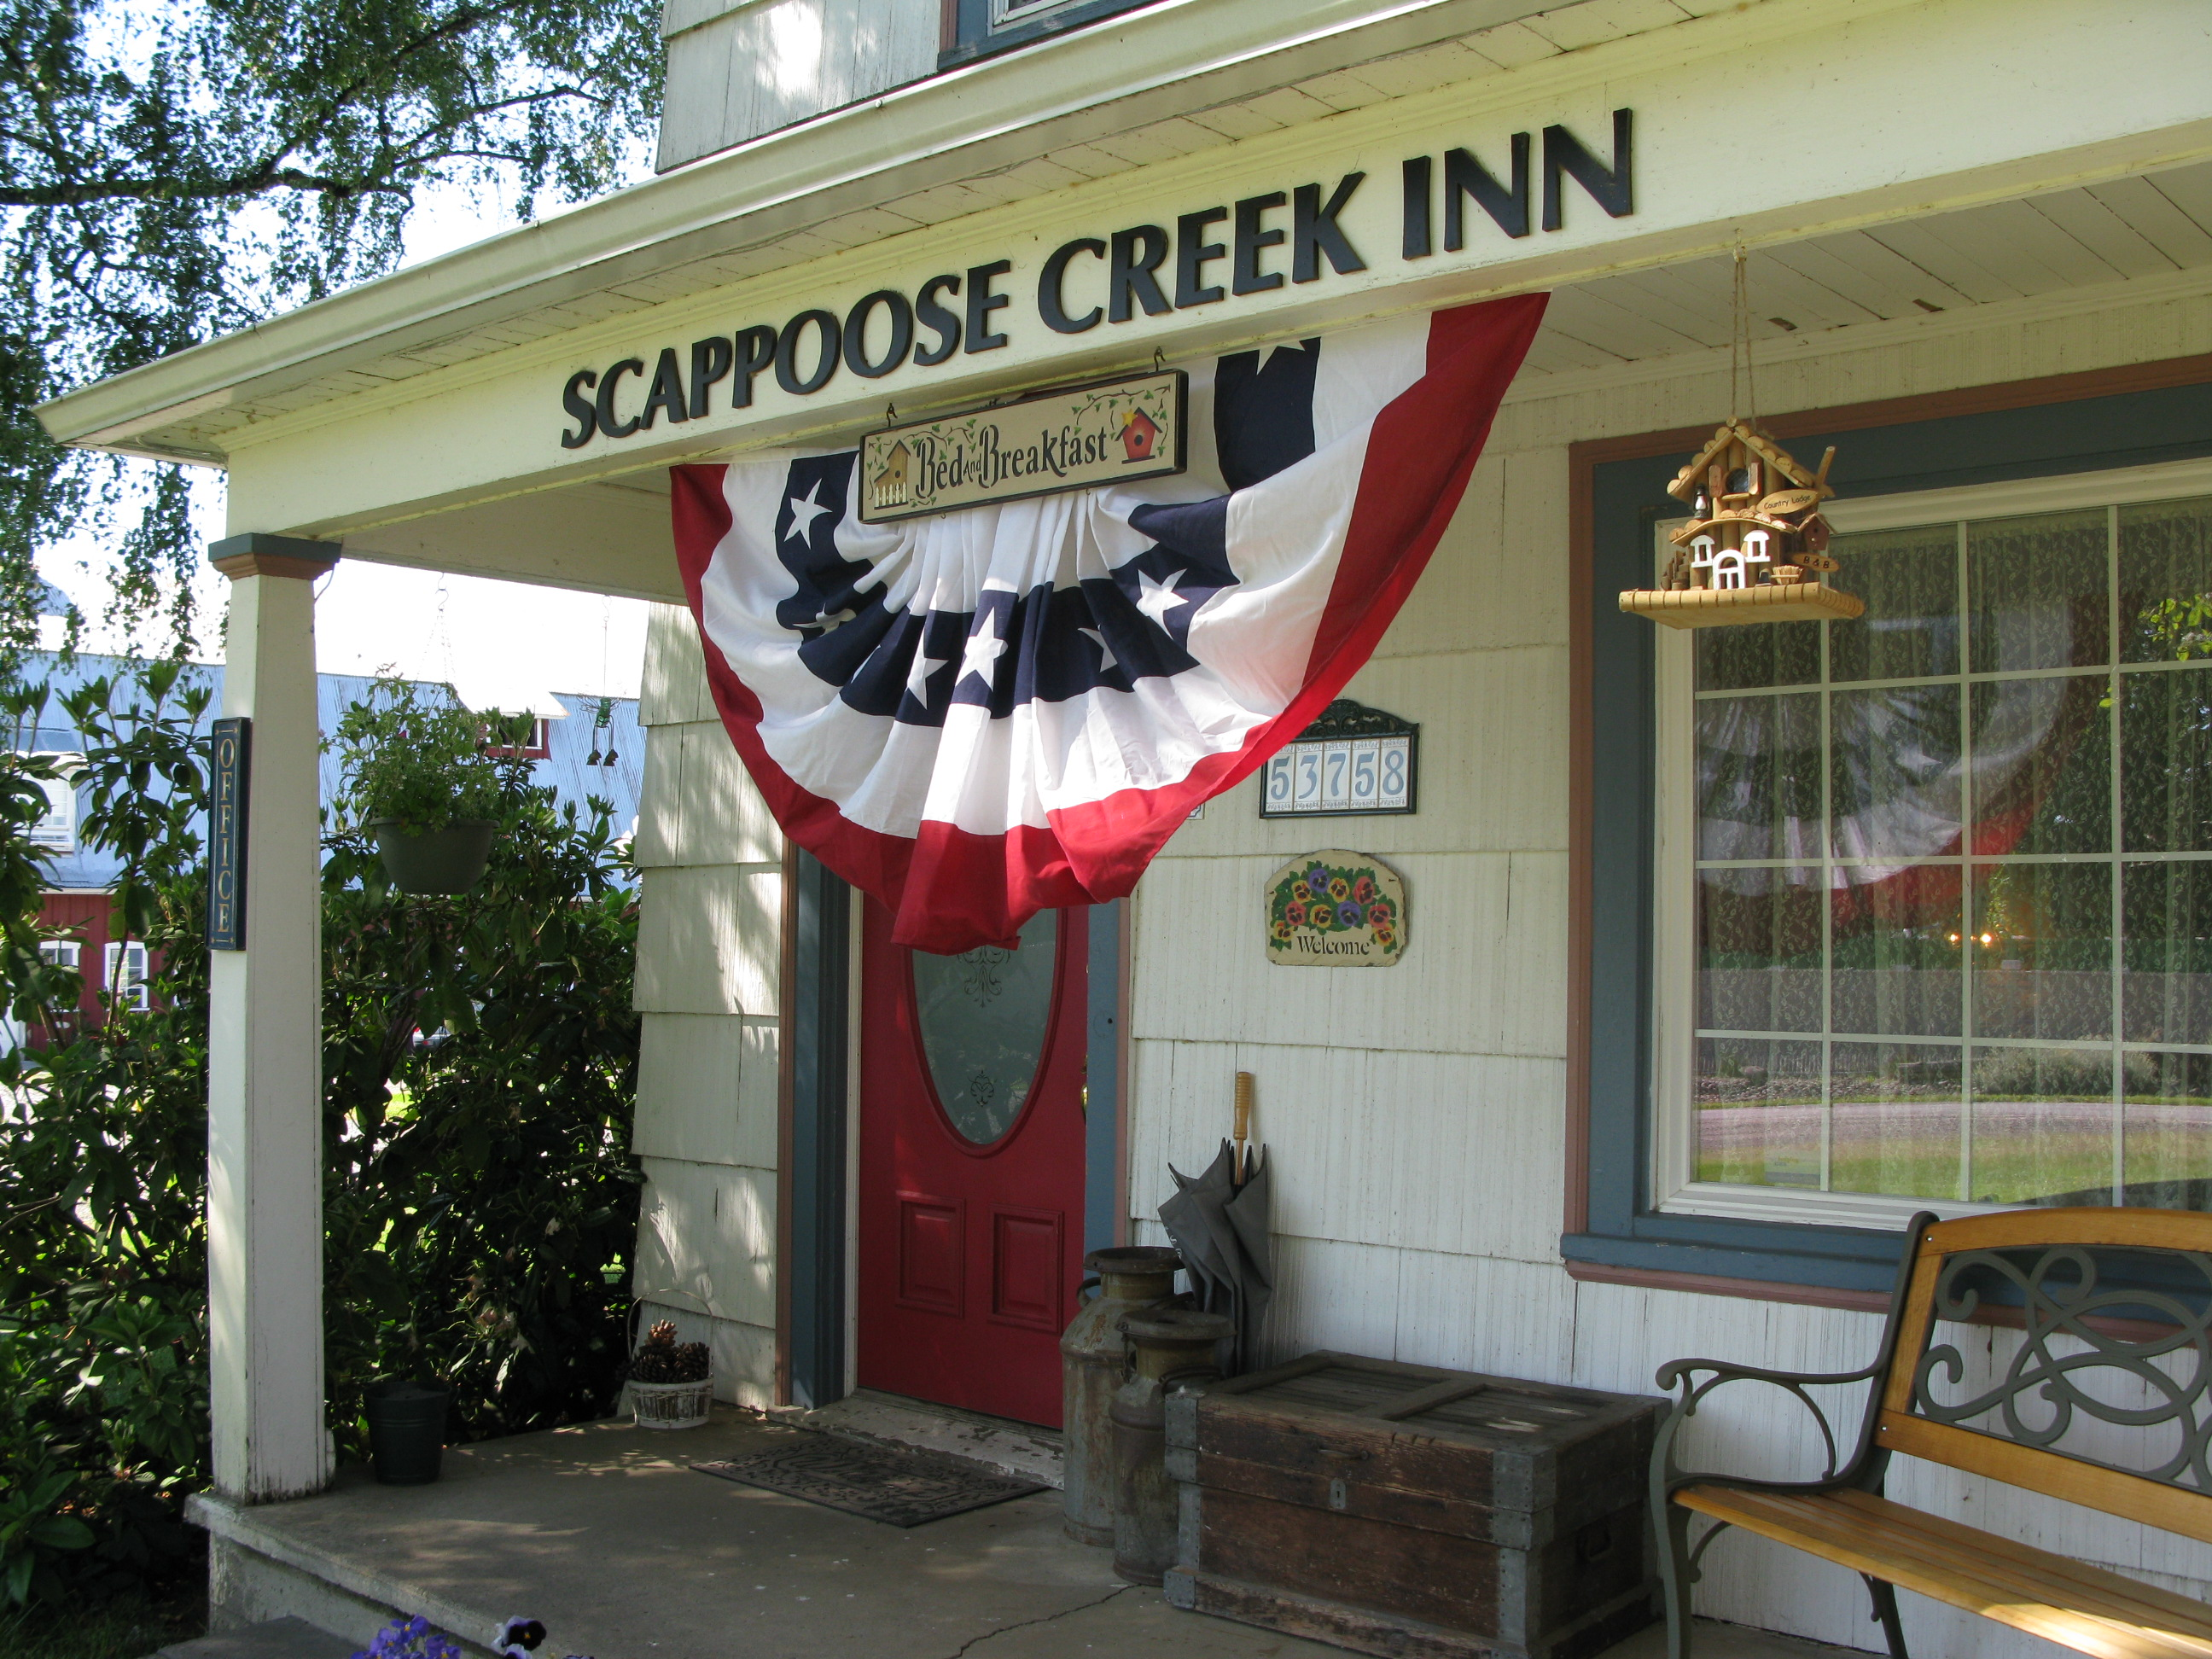 Scappoose Creek Inn